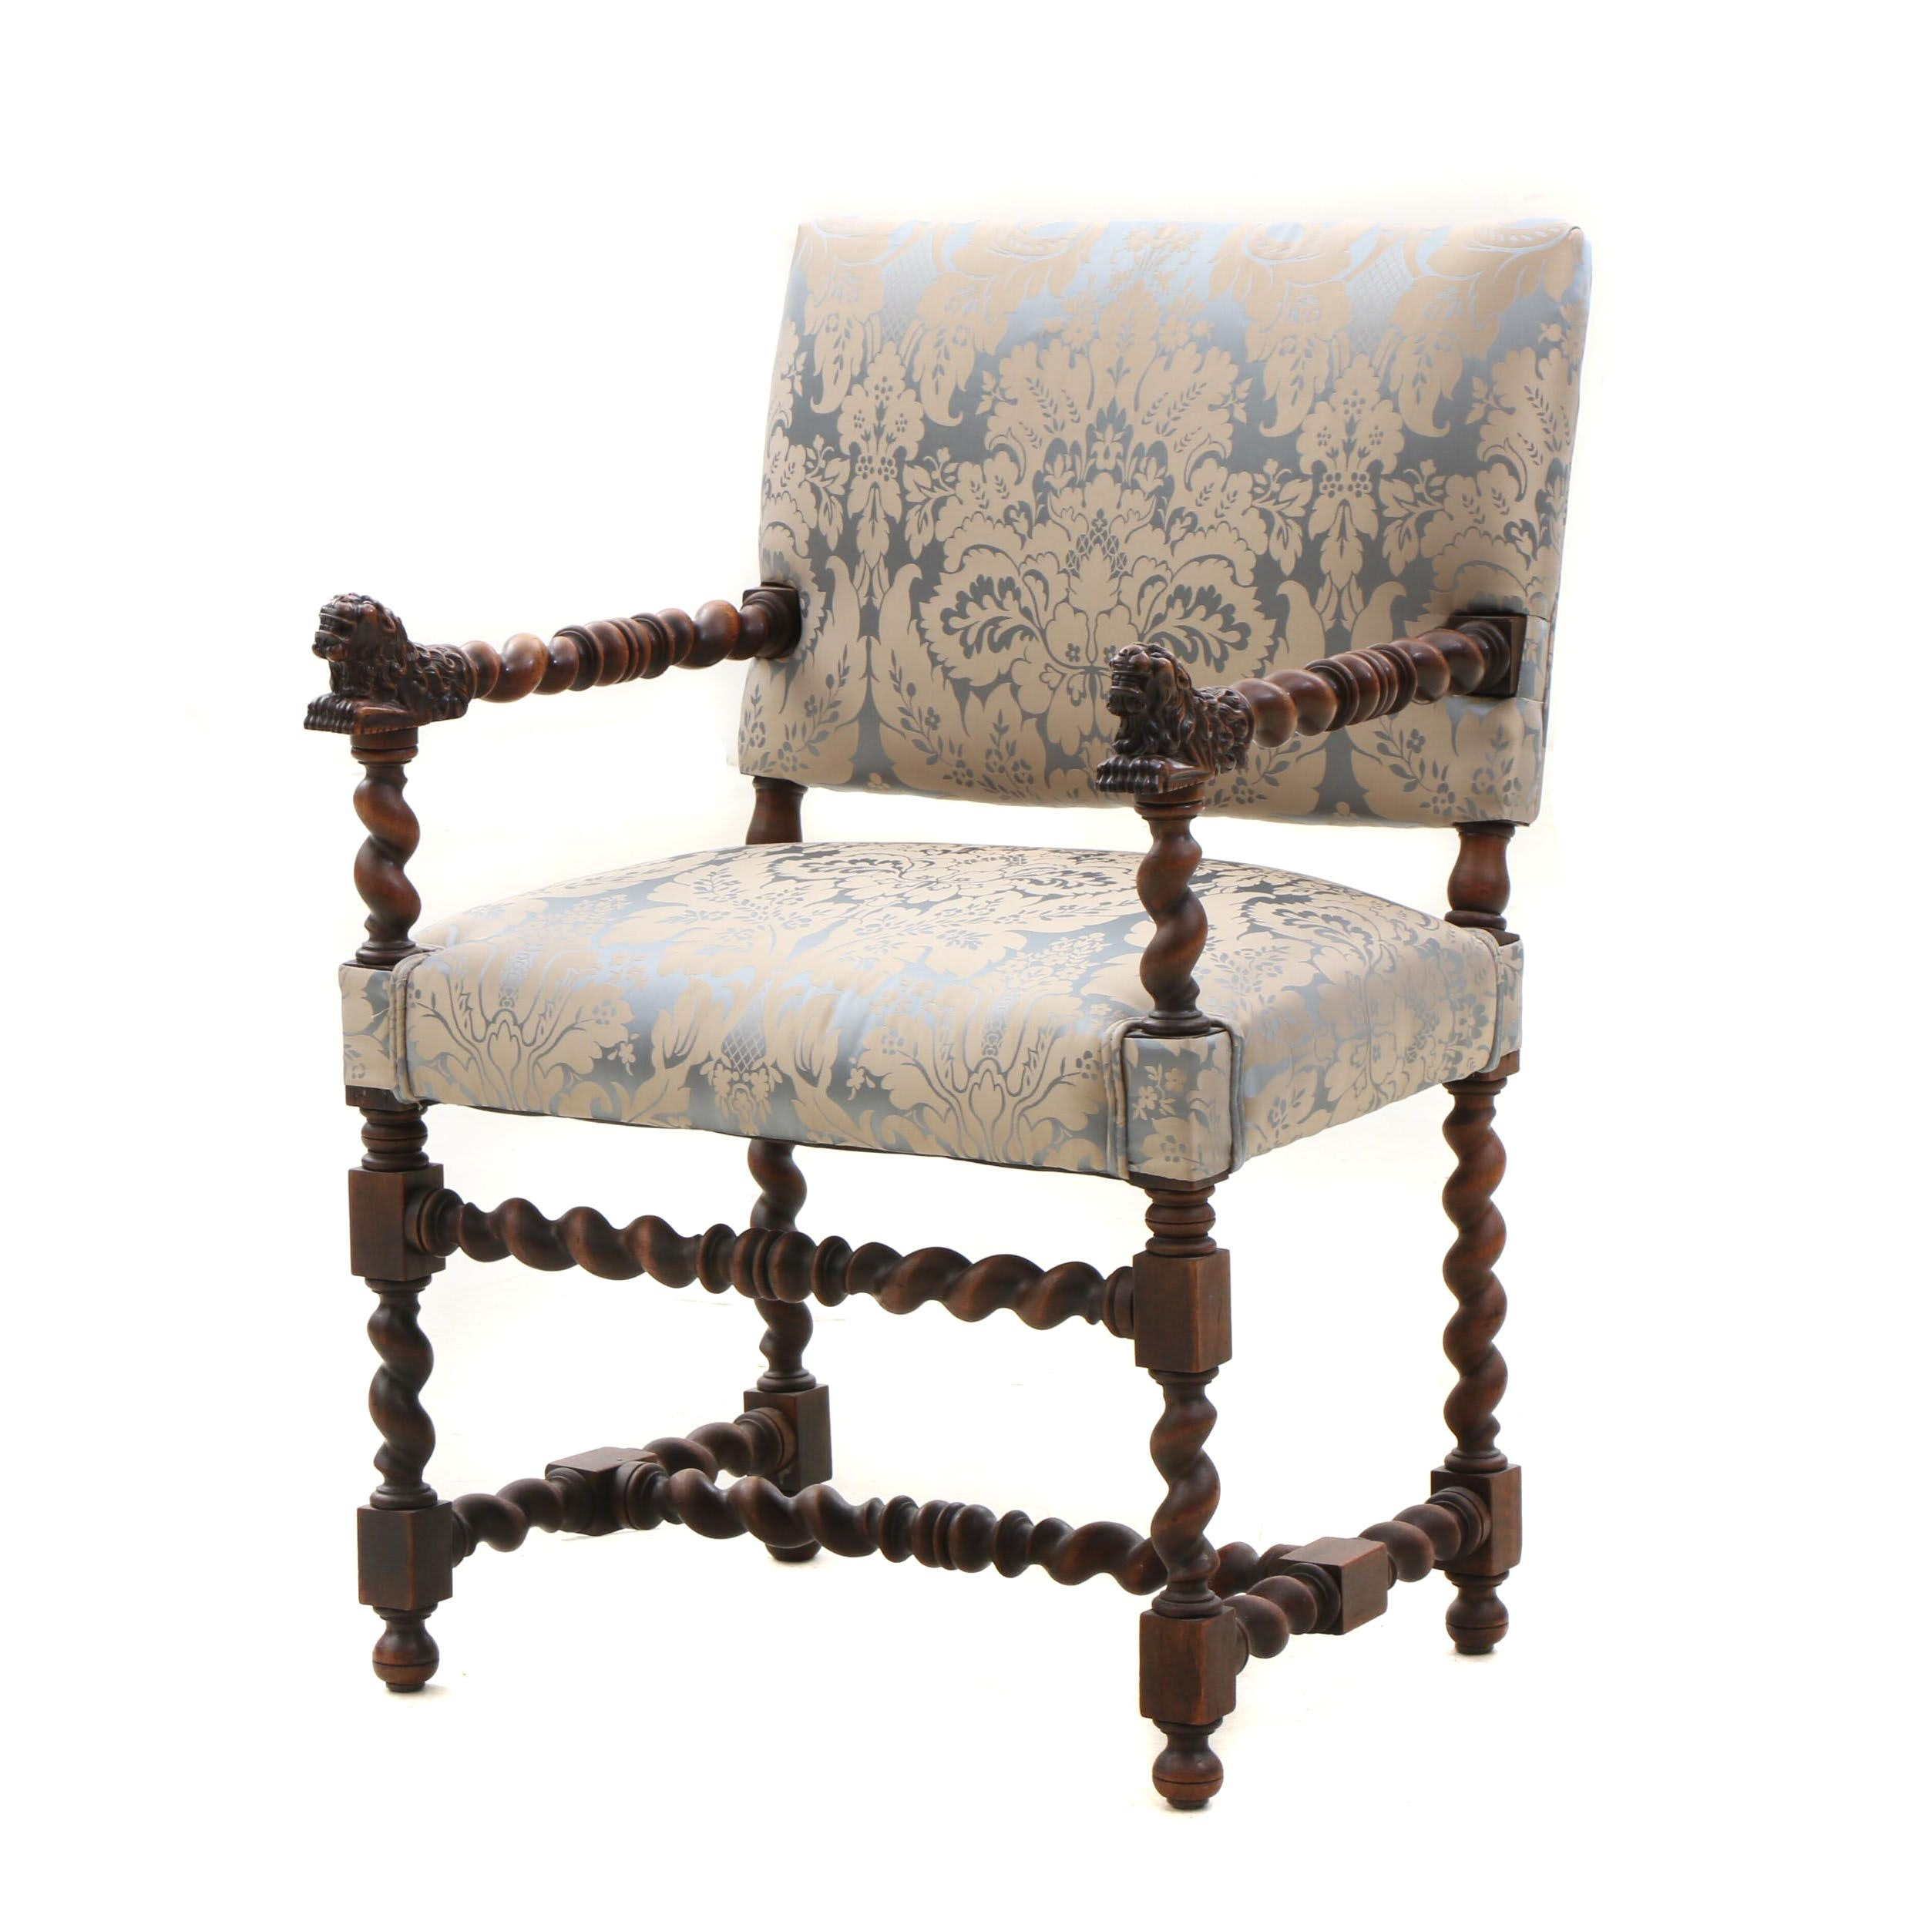 Italian Revival Style Walnut Barley Twist Upholstered Arm Chair